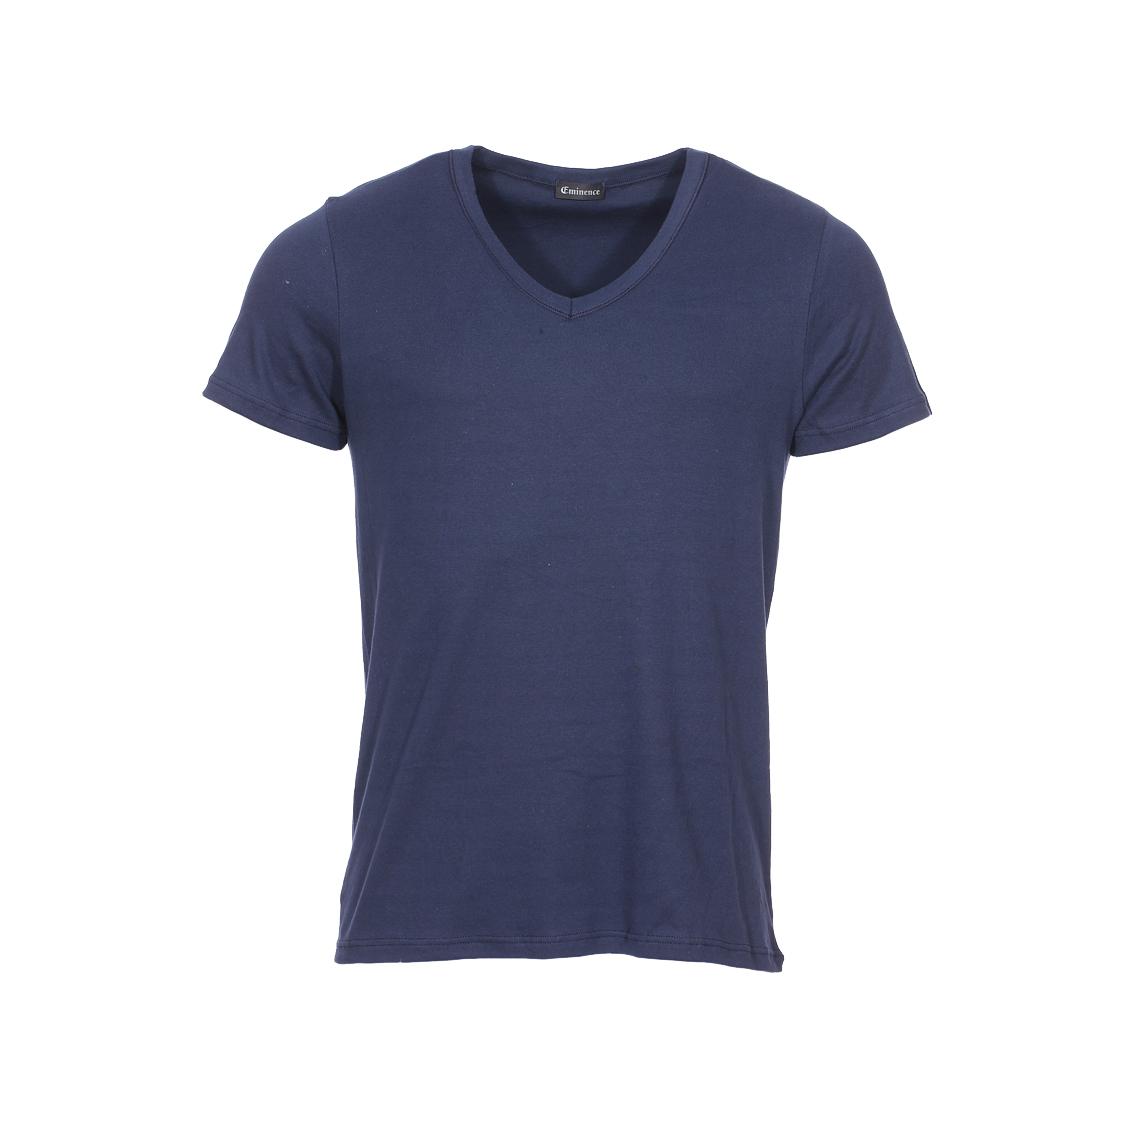 Tee-shirt col V Eminence L'Optimum en coton bleu marine, tissu français